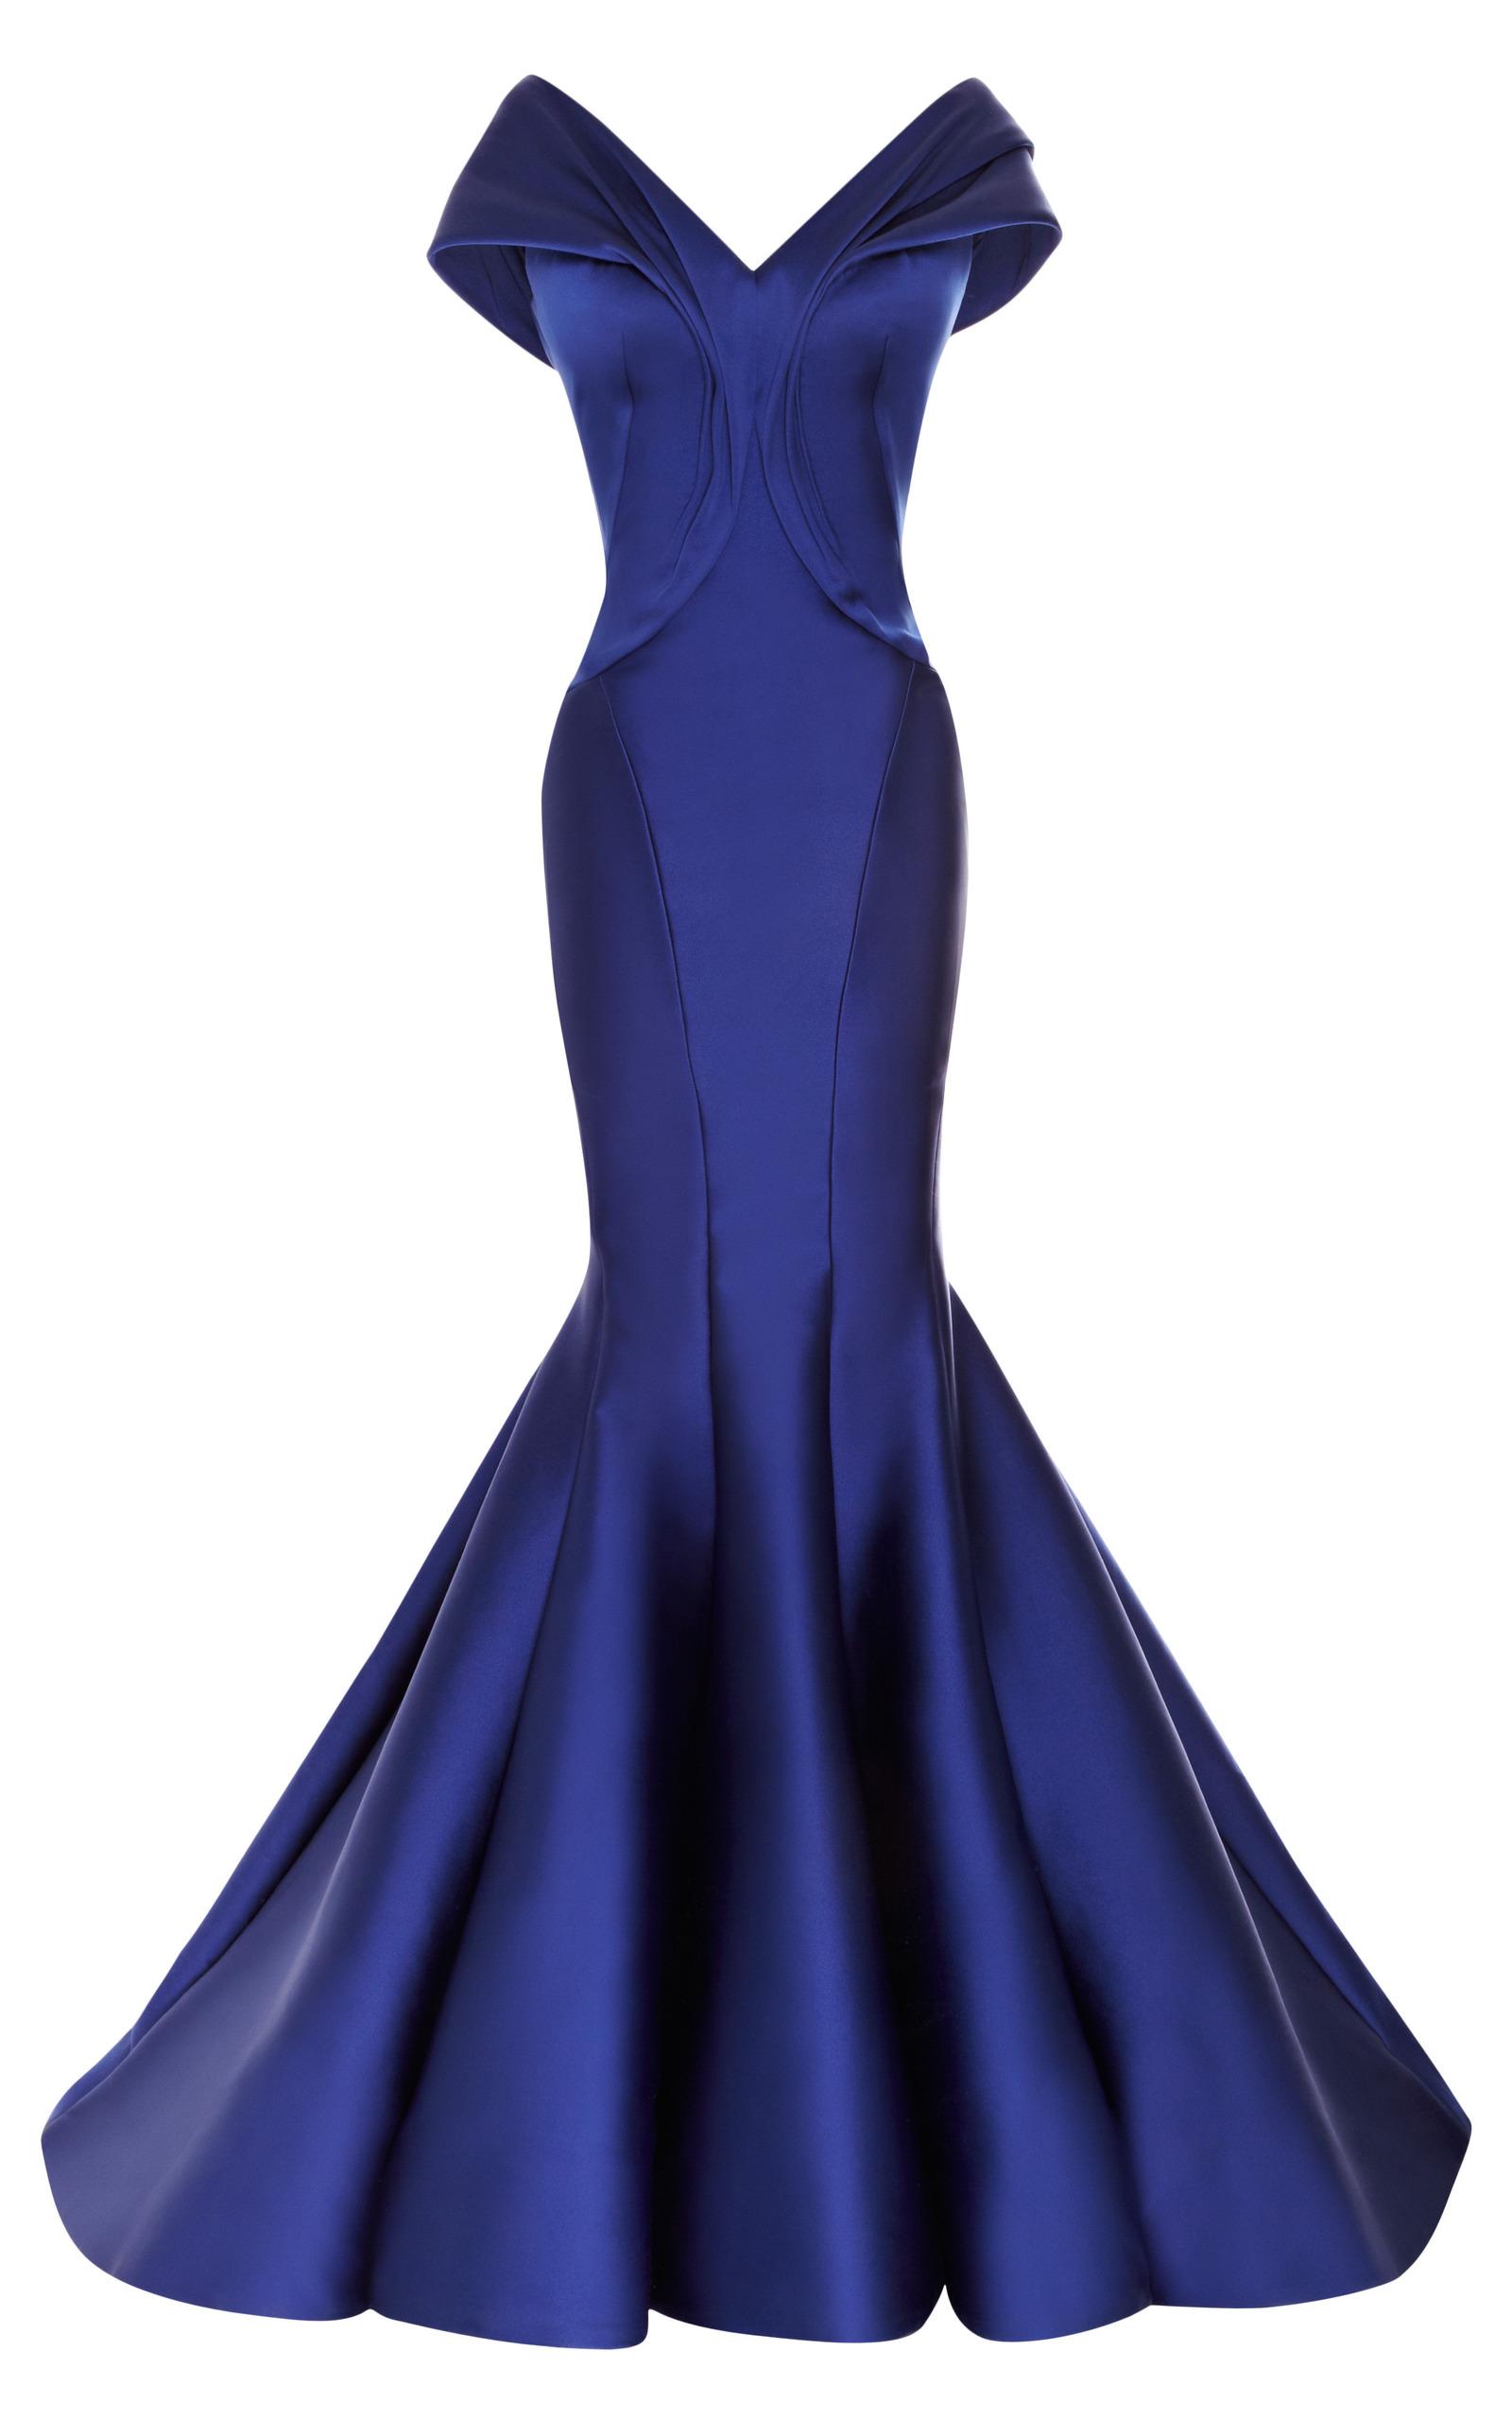 Draped Duchesse Satin Gown By Zac Posen Moda Operandi